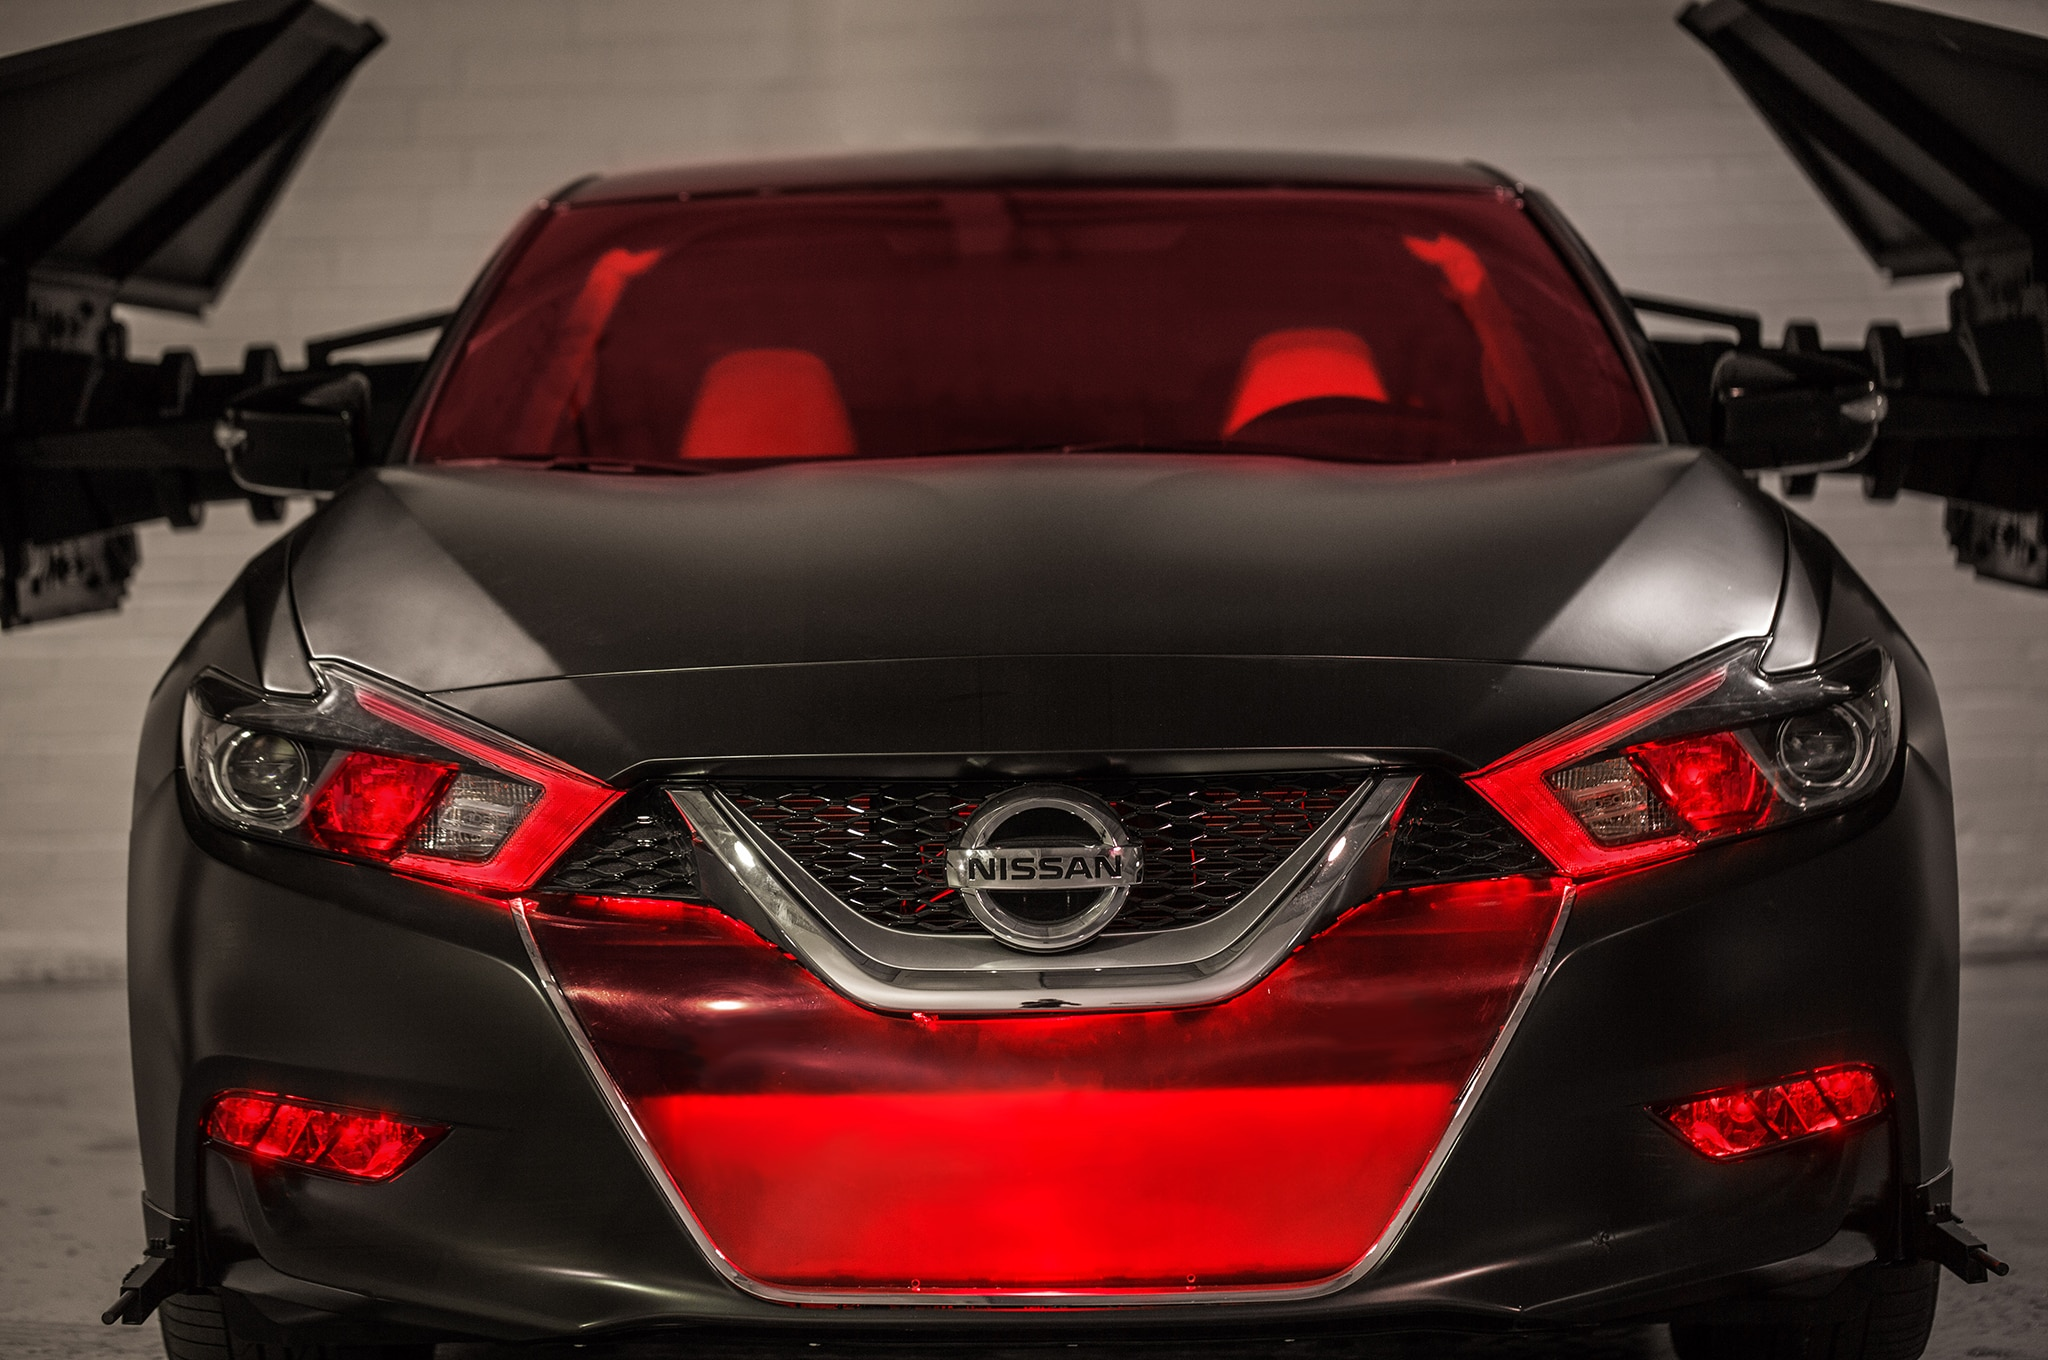 2018 Nissan Maxima Show Car Kylo Rens TIE Silencer